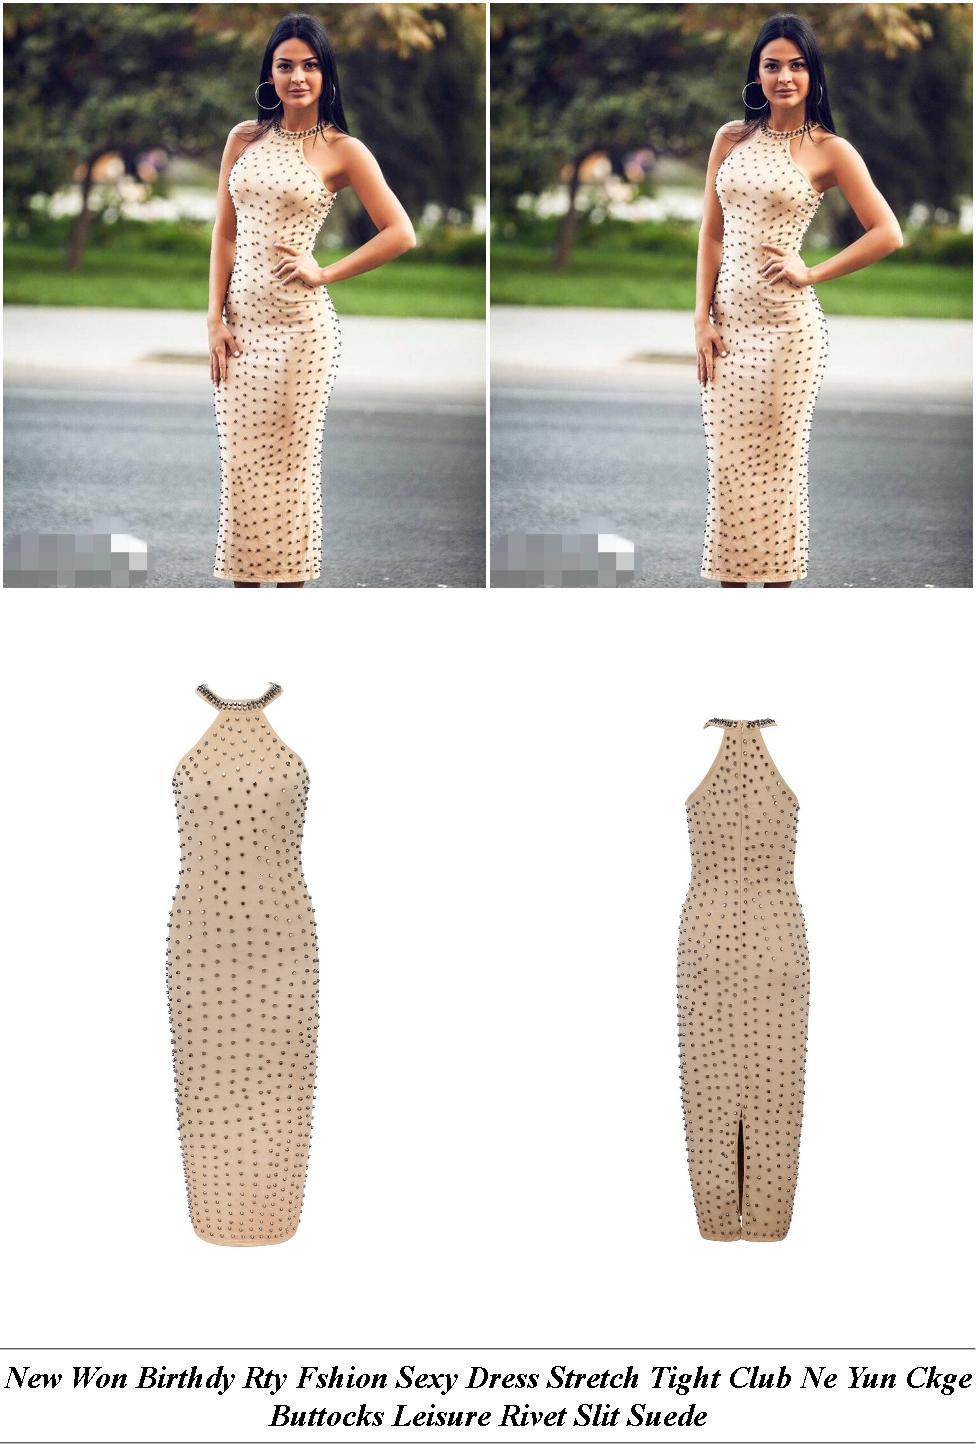 Beautiful Dresses For Women - Maternity Clothes Sale Topshop - Wrap Satin Dress Green